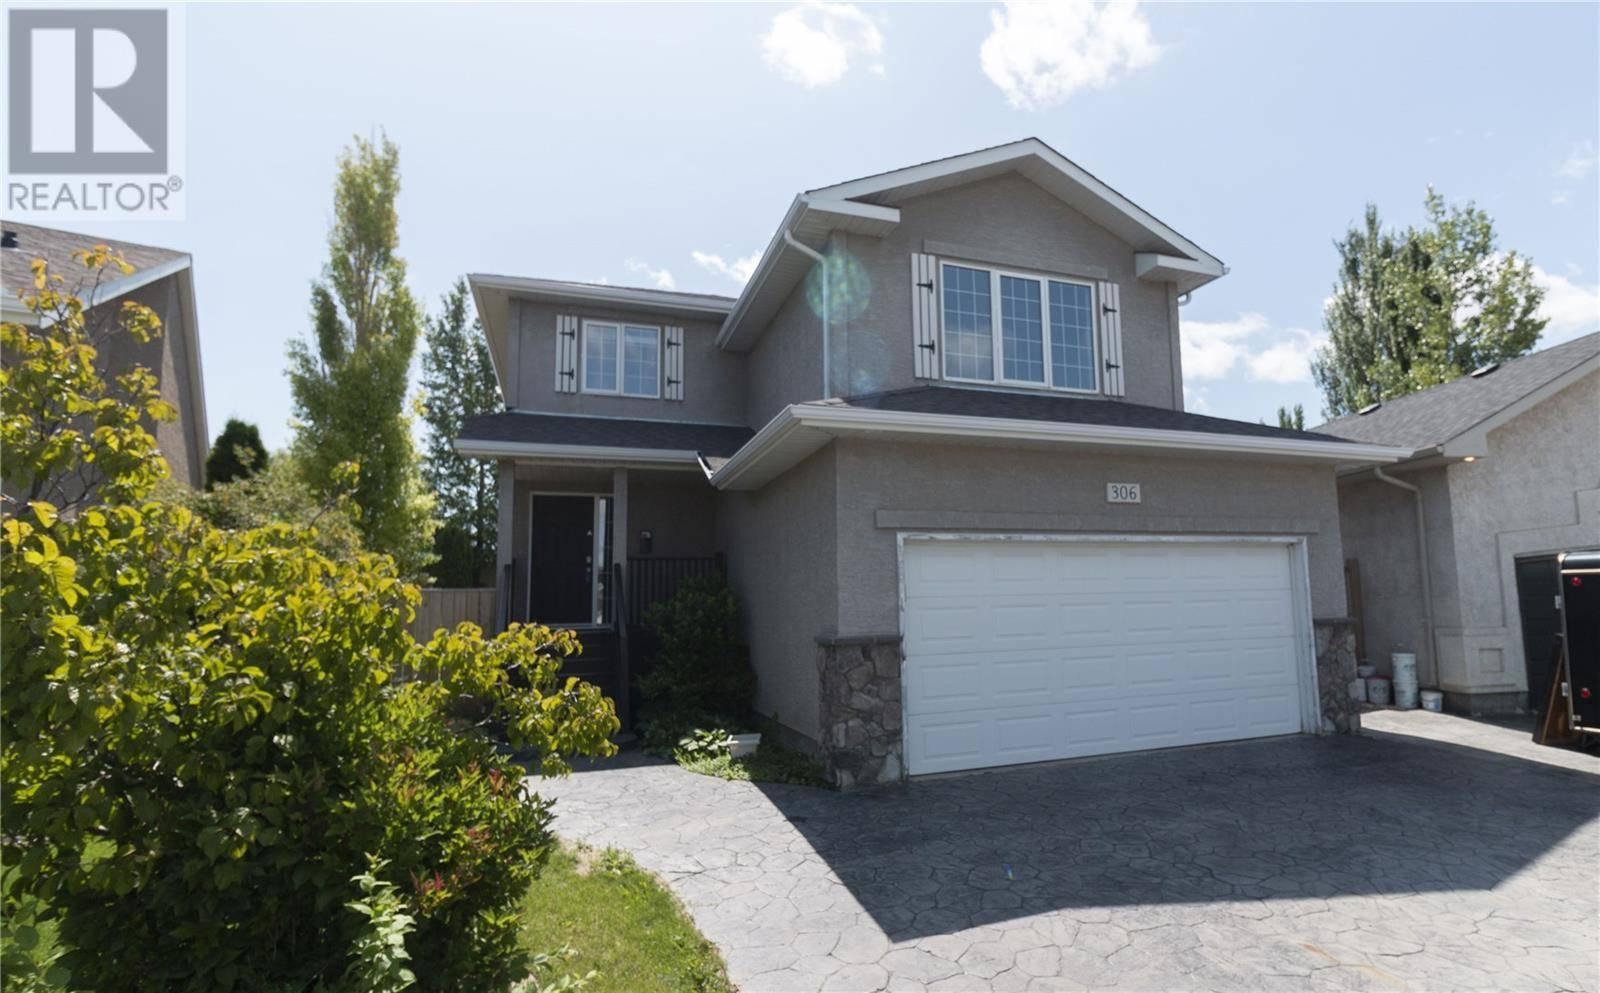 House for sale at 306 Peters Cv  Saskatoon Saskatchewan - MLS: SK781646